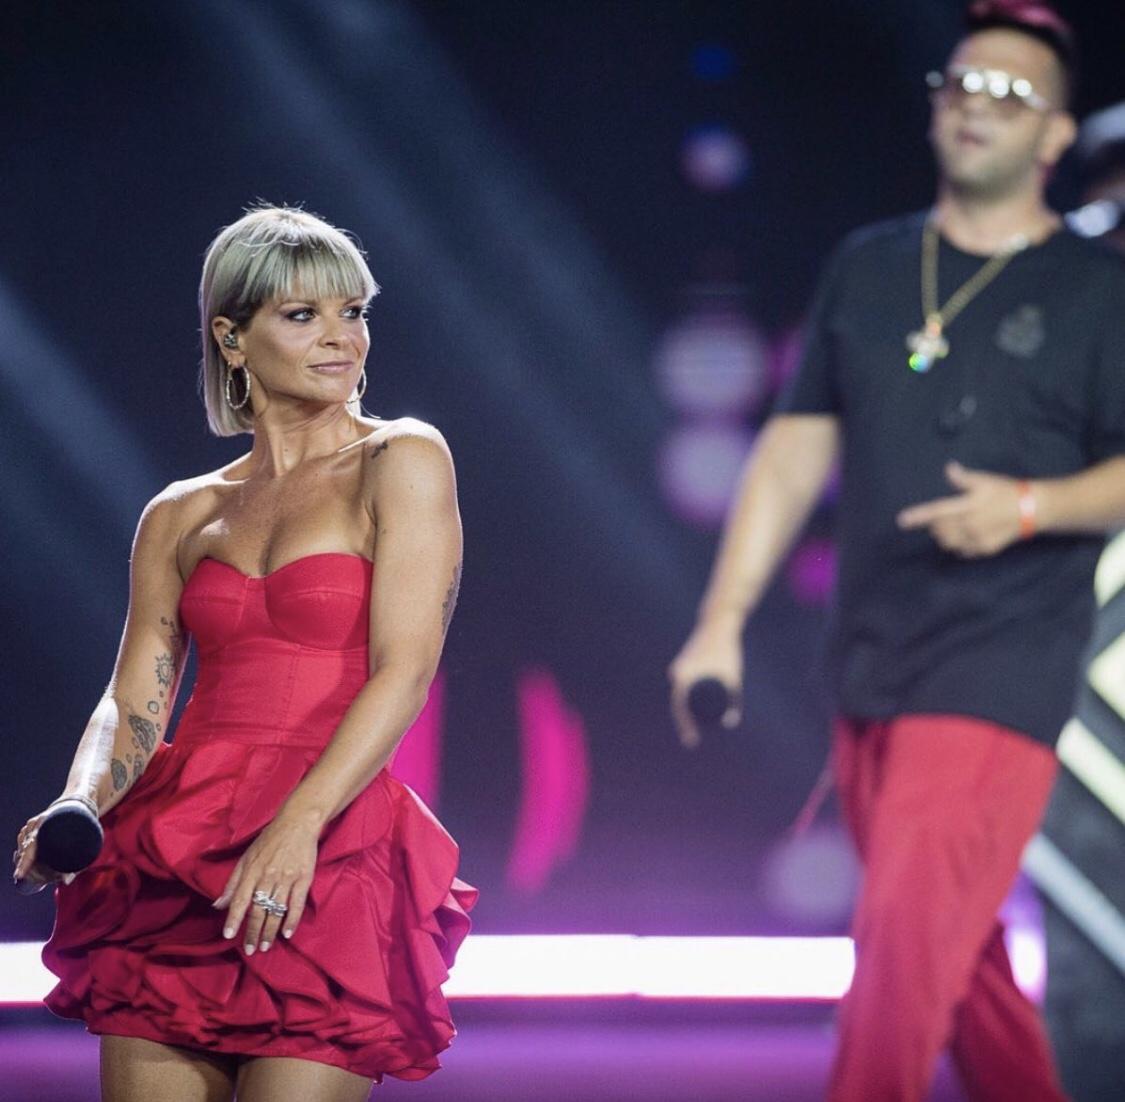 Battiti Live, stasera la prima puntata: tra gli ospiti Amoroso, Boomdabash e Elodie – Salento News